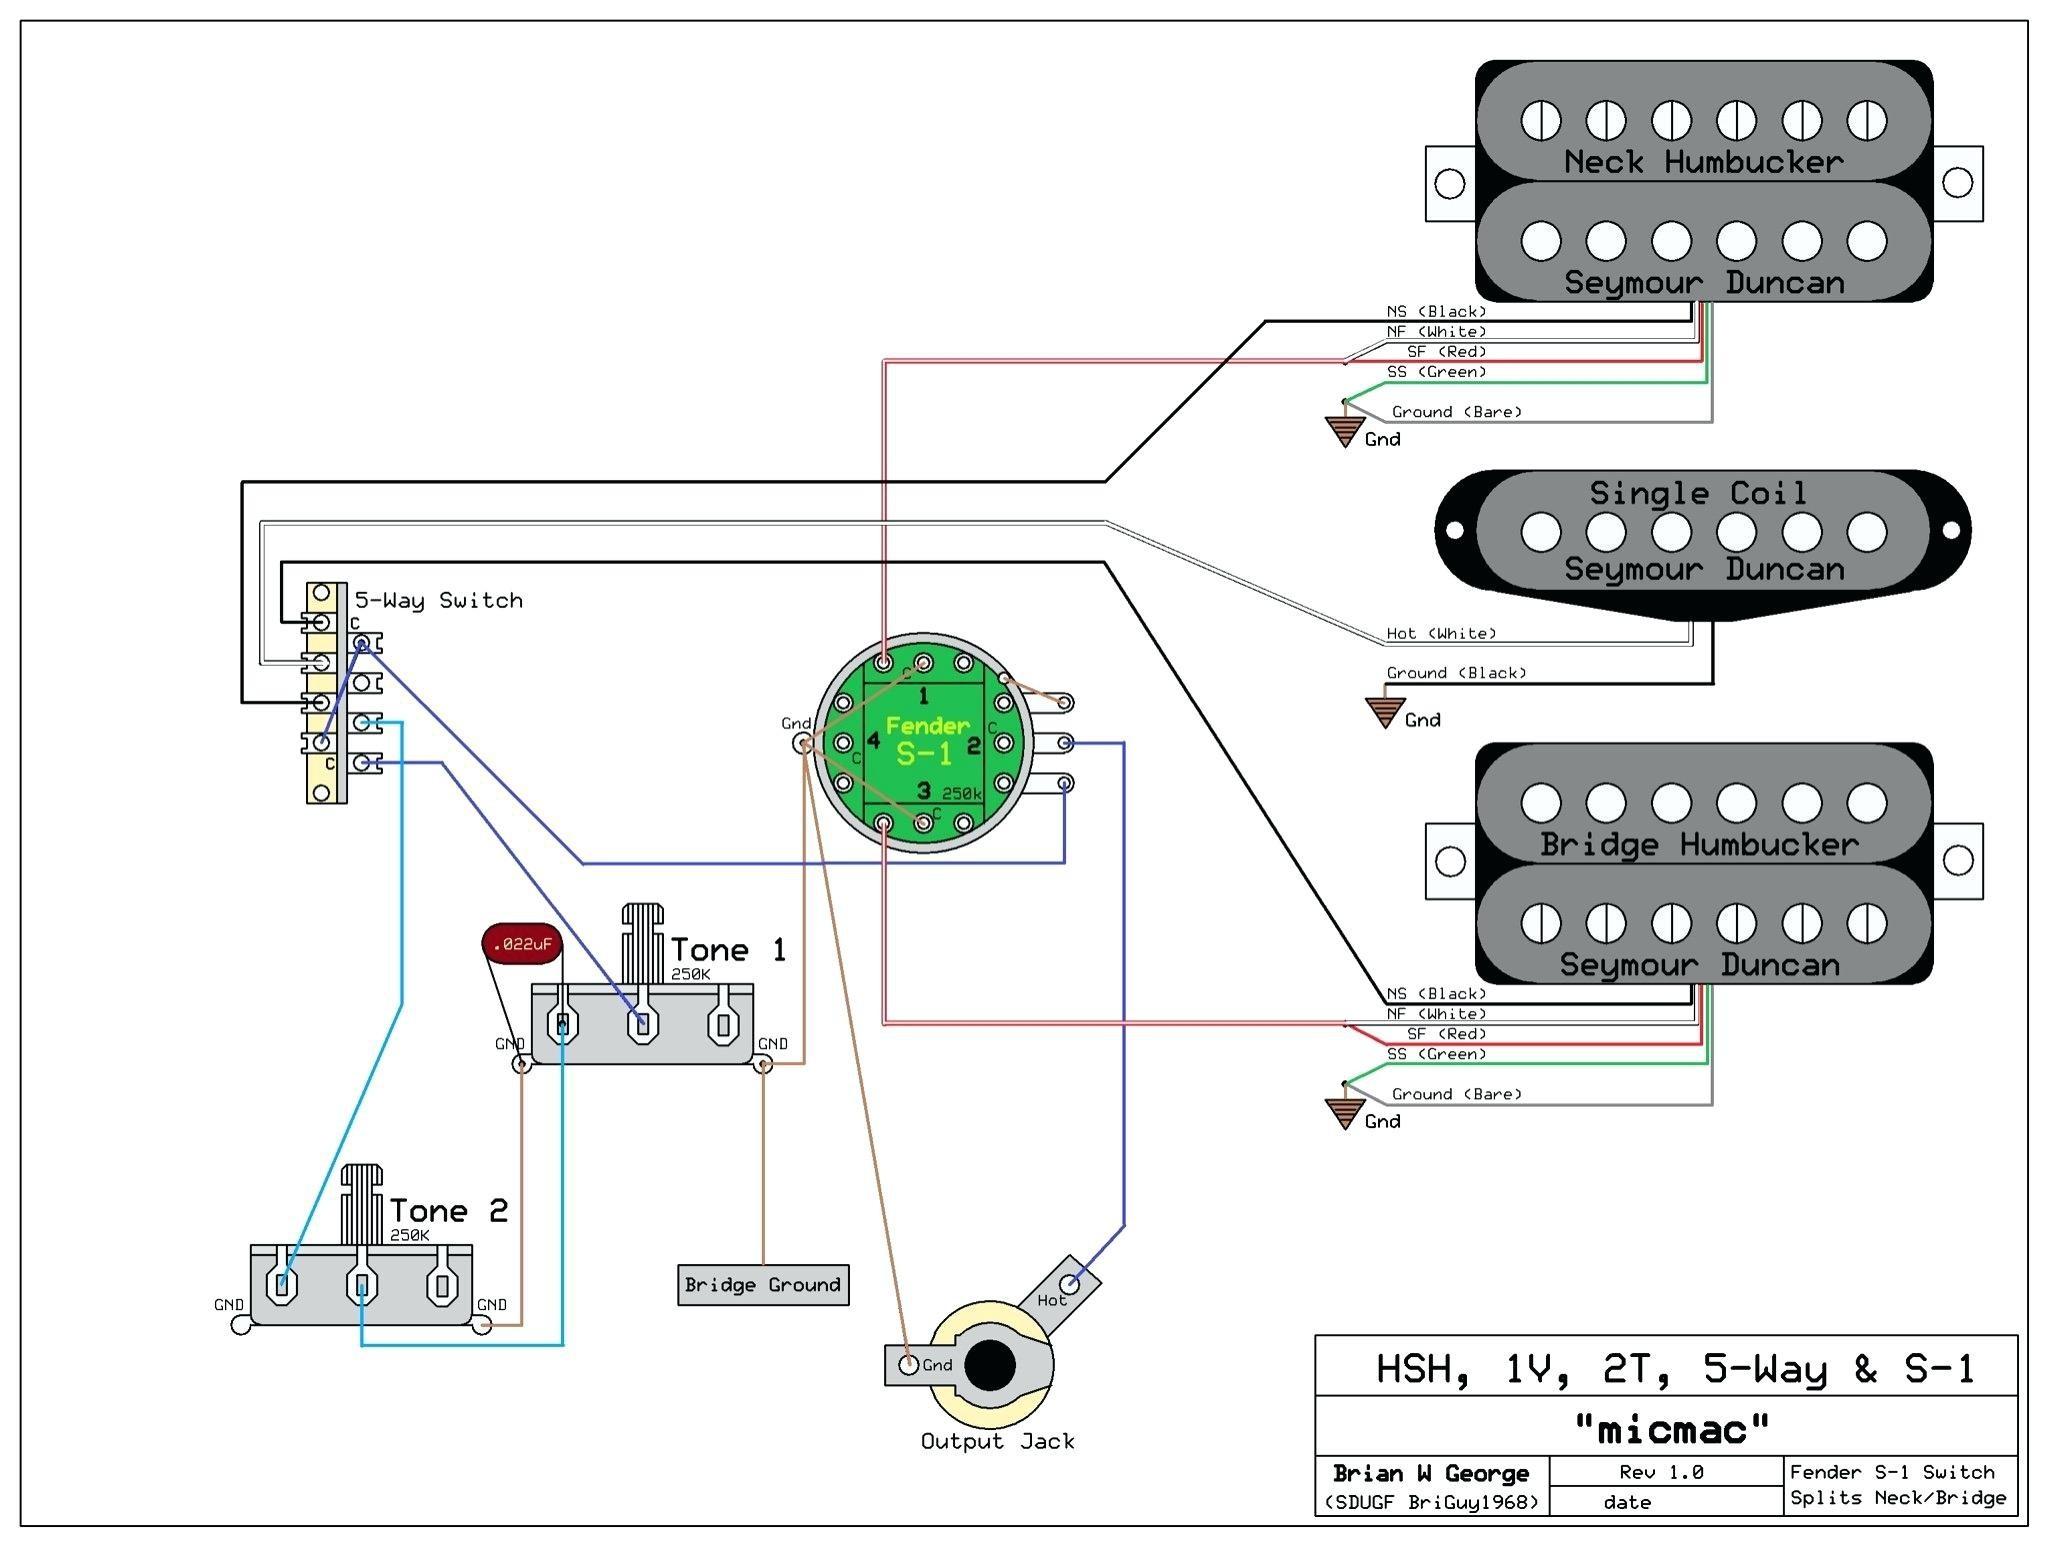 Humbucker Wiring Diagram Fresh Emg 81 85 Wiring Diagram 2 Volume 1 tone Pressure Switch Well